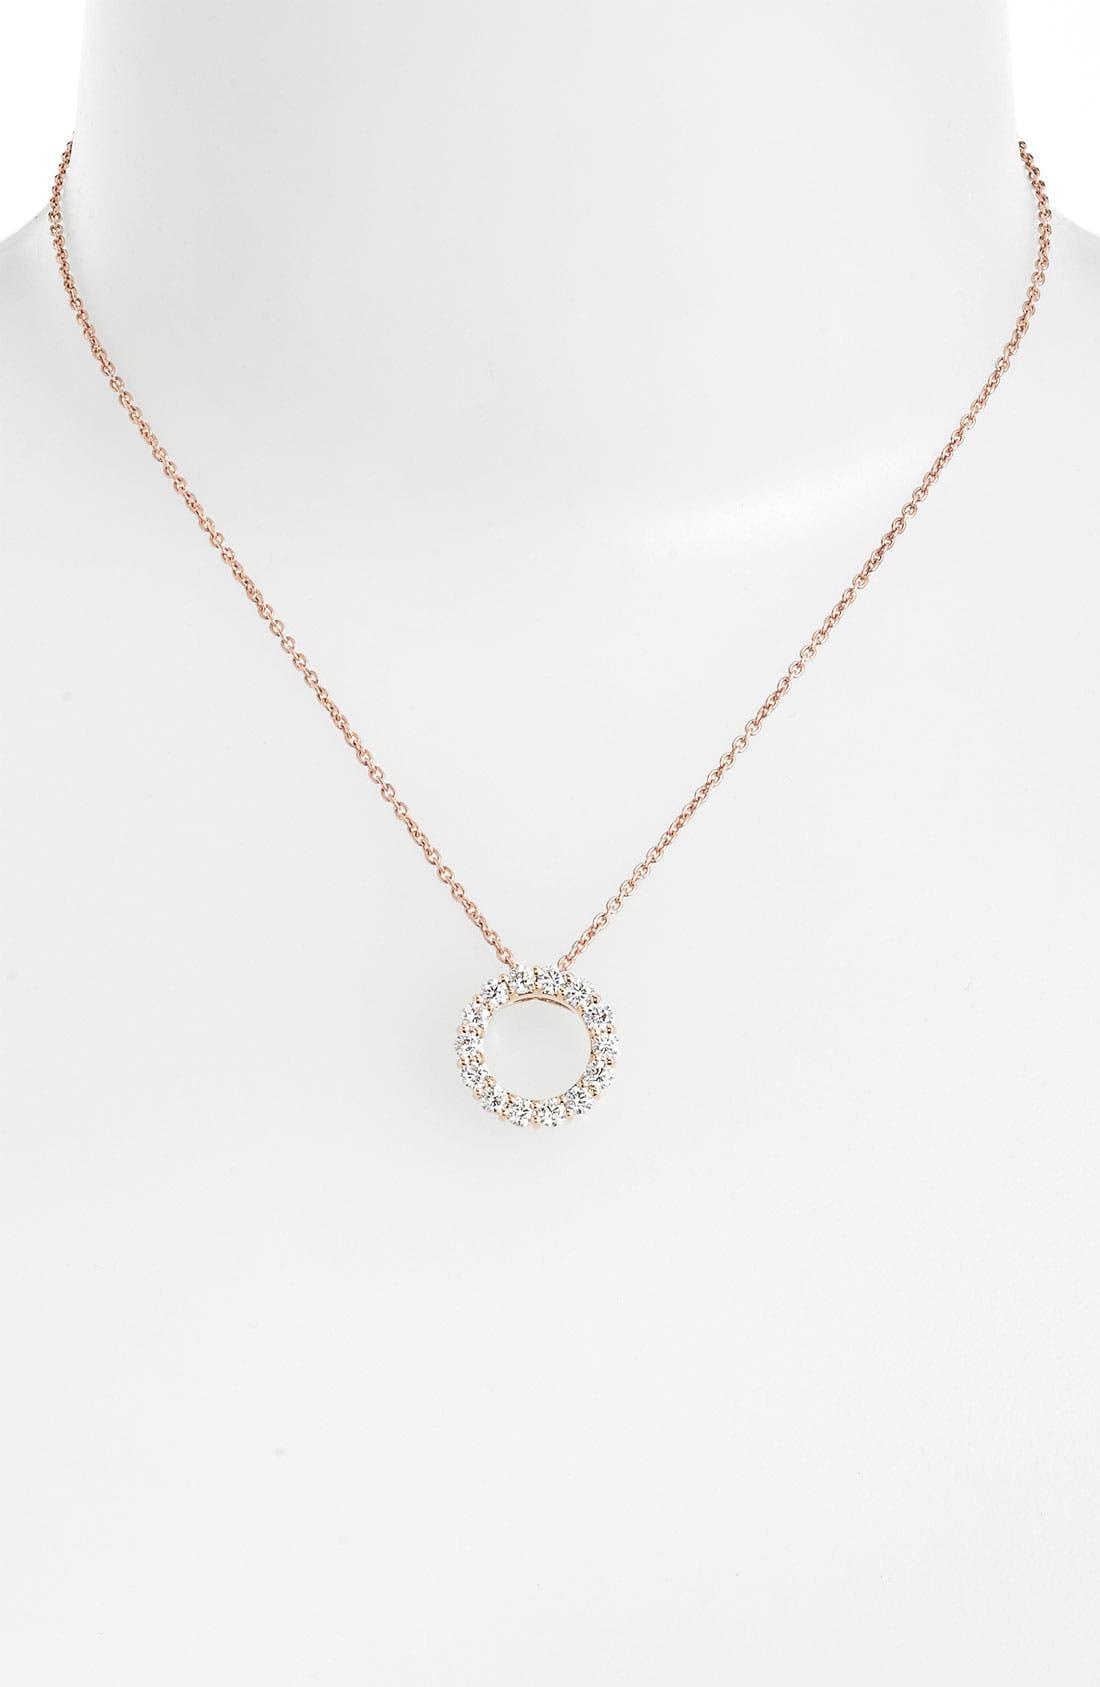 Main Image - Roberto Coin 'Tiny Treasures - Circle of Life' Diamond Necklace